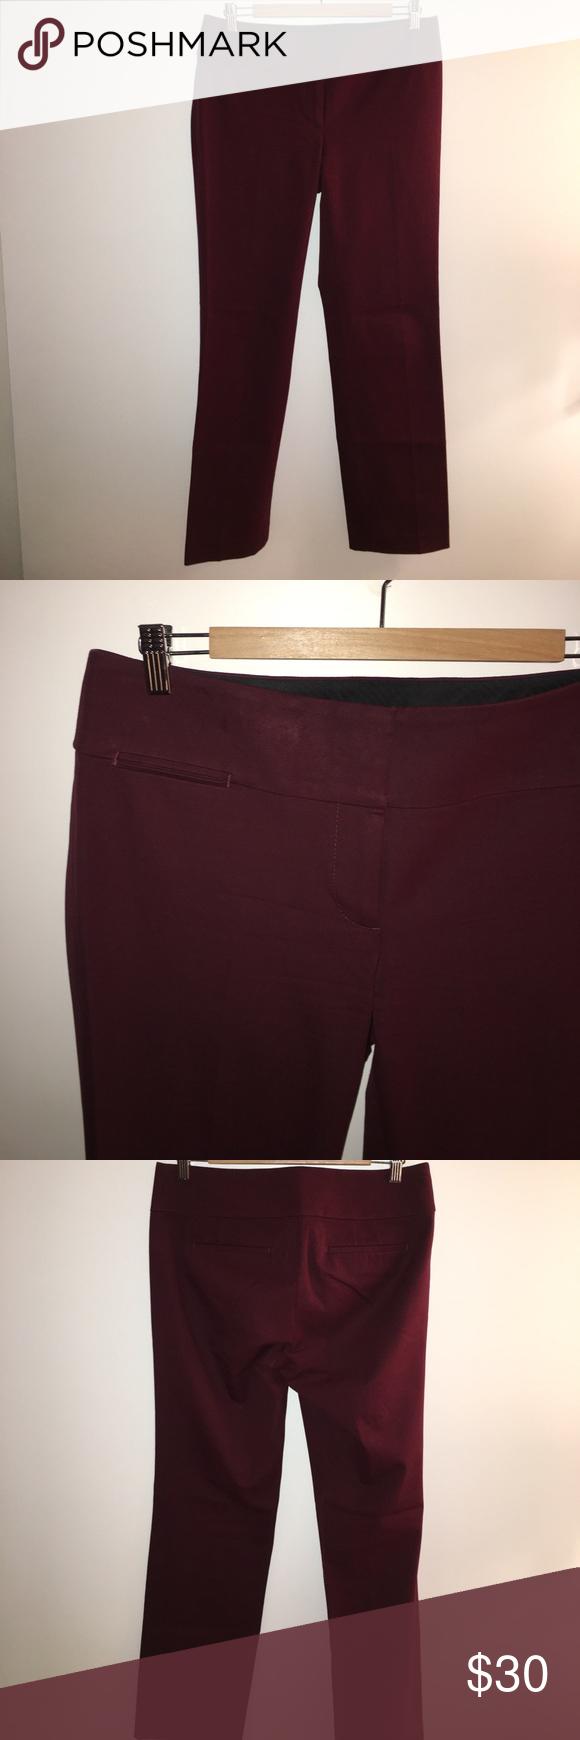 Loft burgundy trousers Loft burgundy trouser pants - brand new never worn with original tag; regular length pants LOFT Pants Trousers